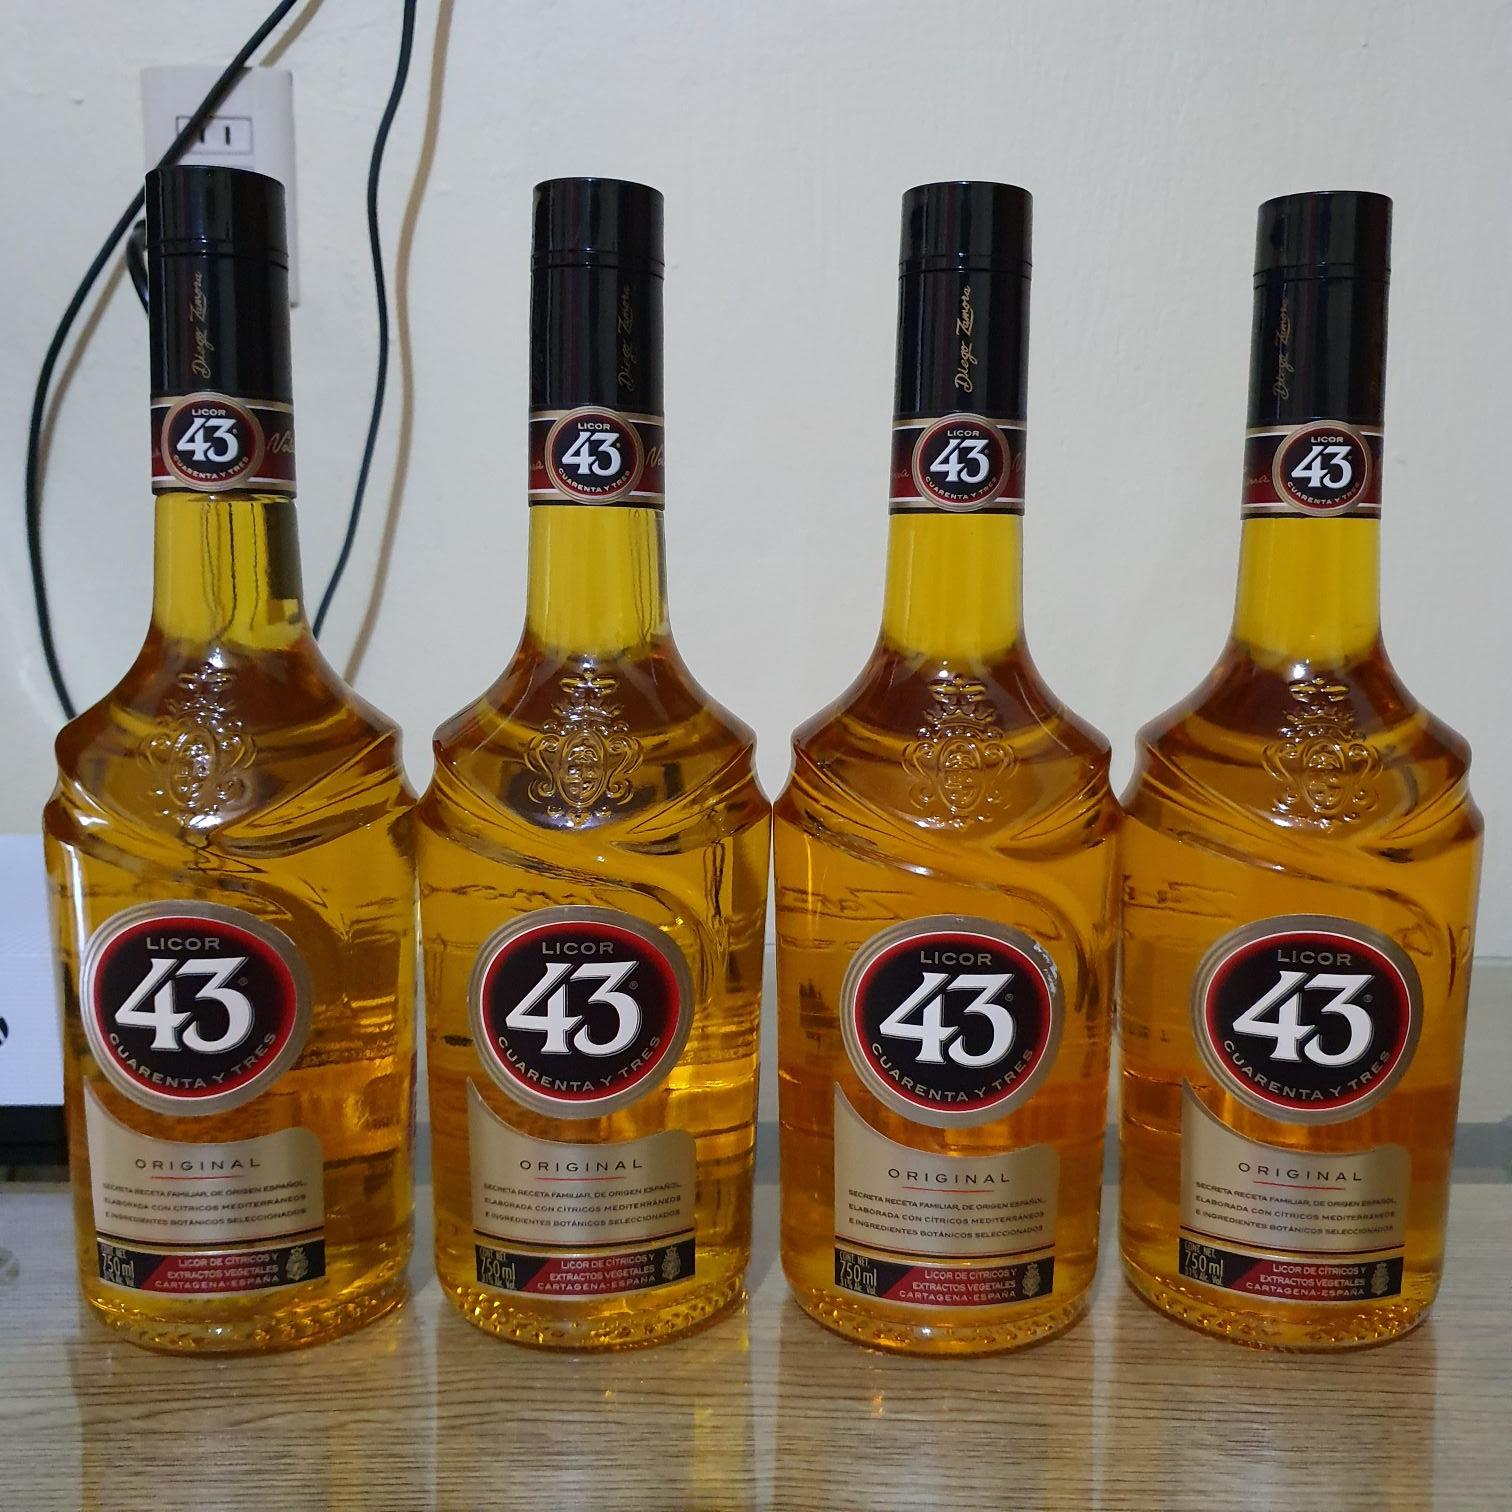 Soriana: Licor 43